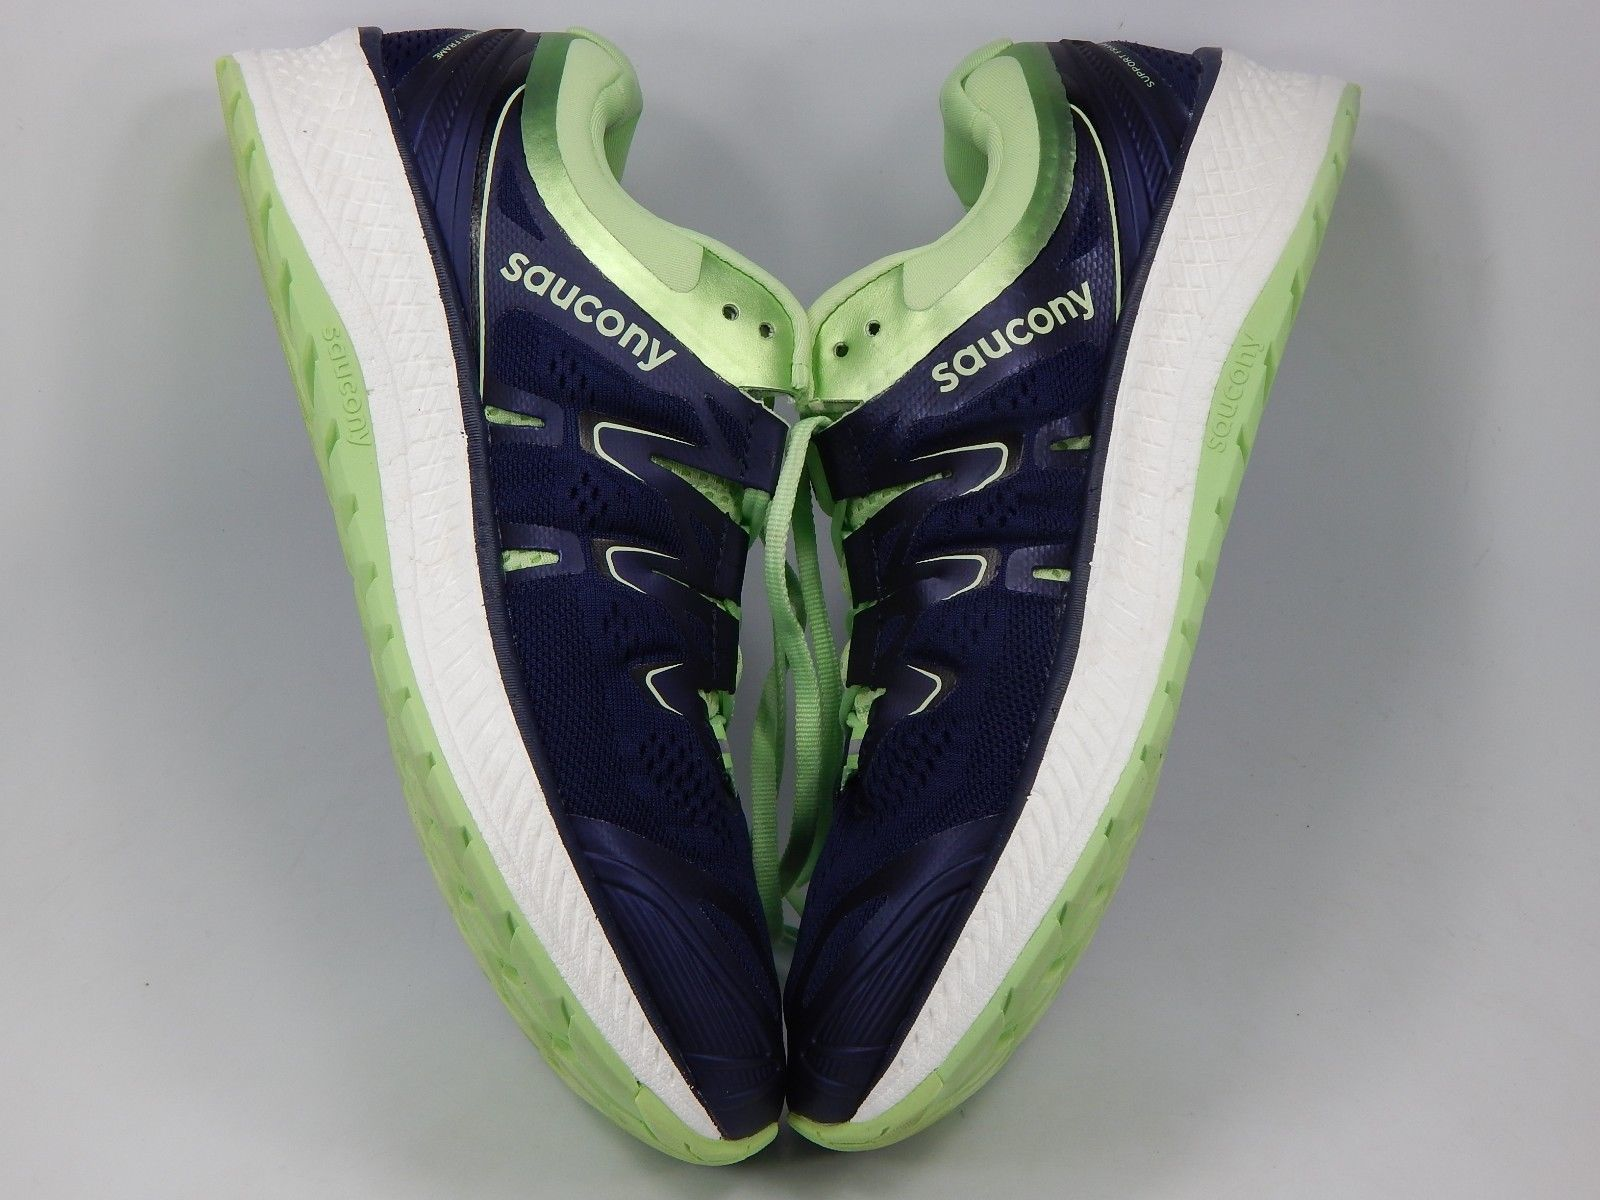 Saucony Triumph ISO 4 Size 9.5 M (B) EU 41 Women's Running Shoes Blue S10413-3